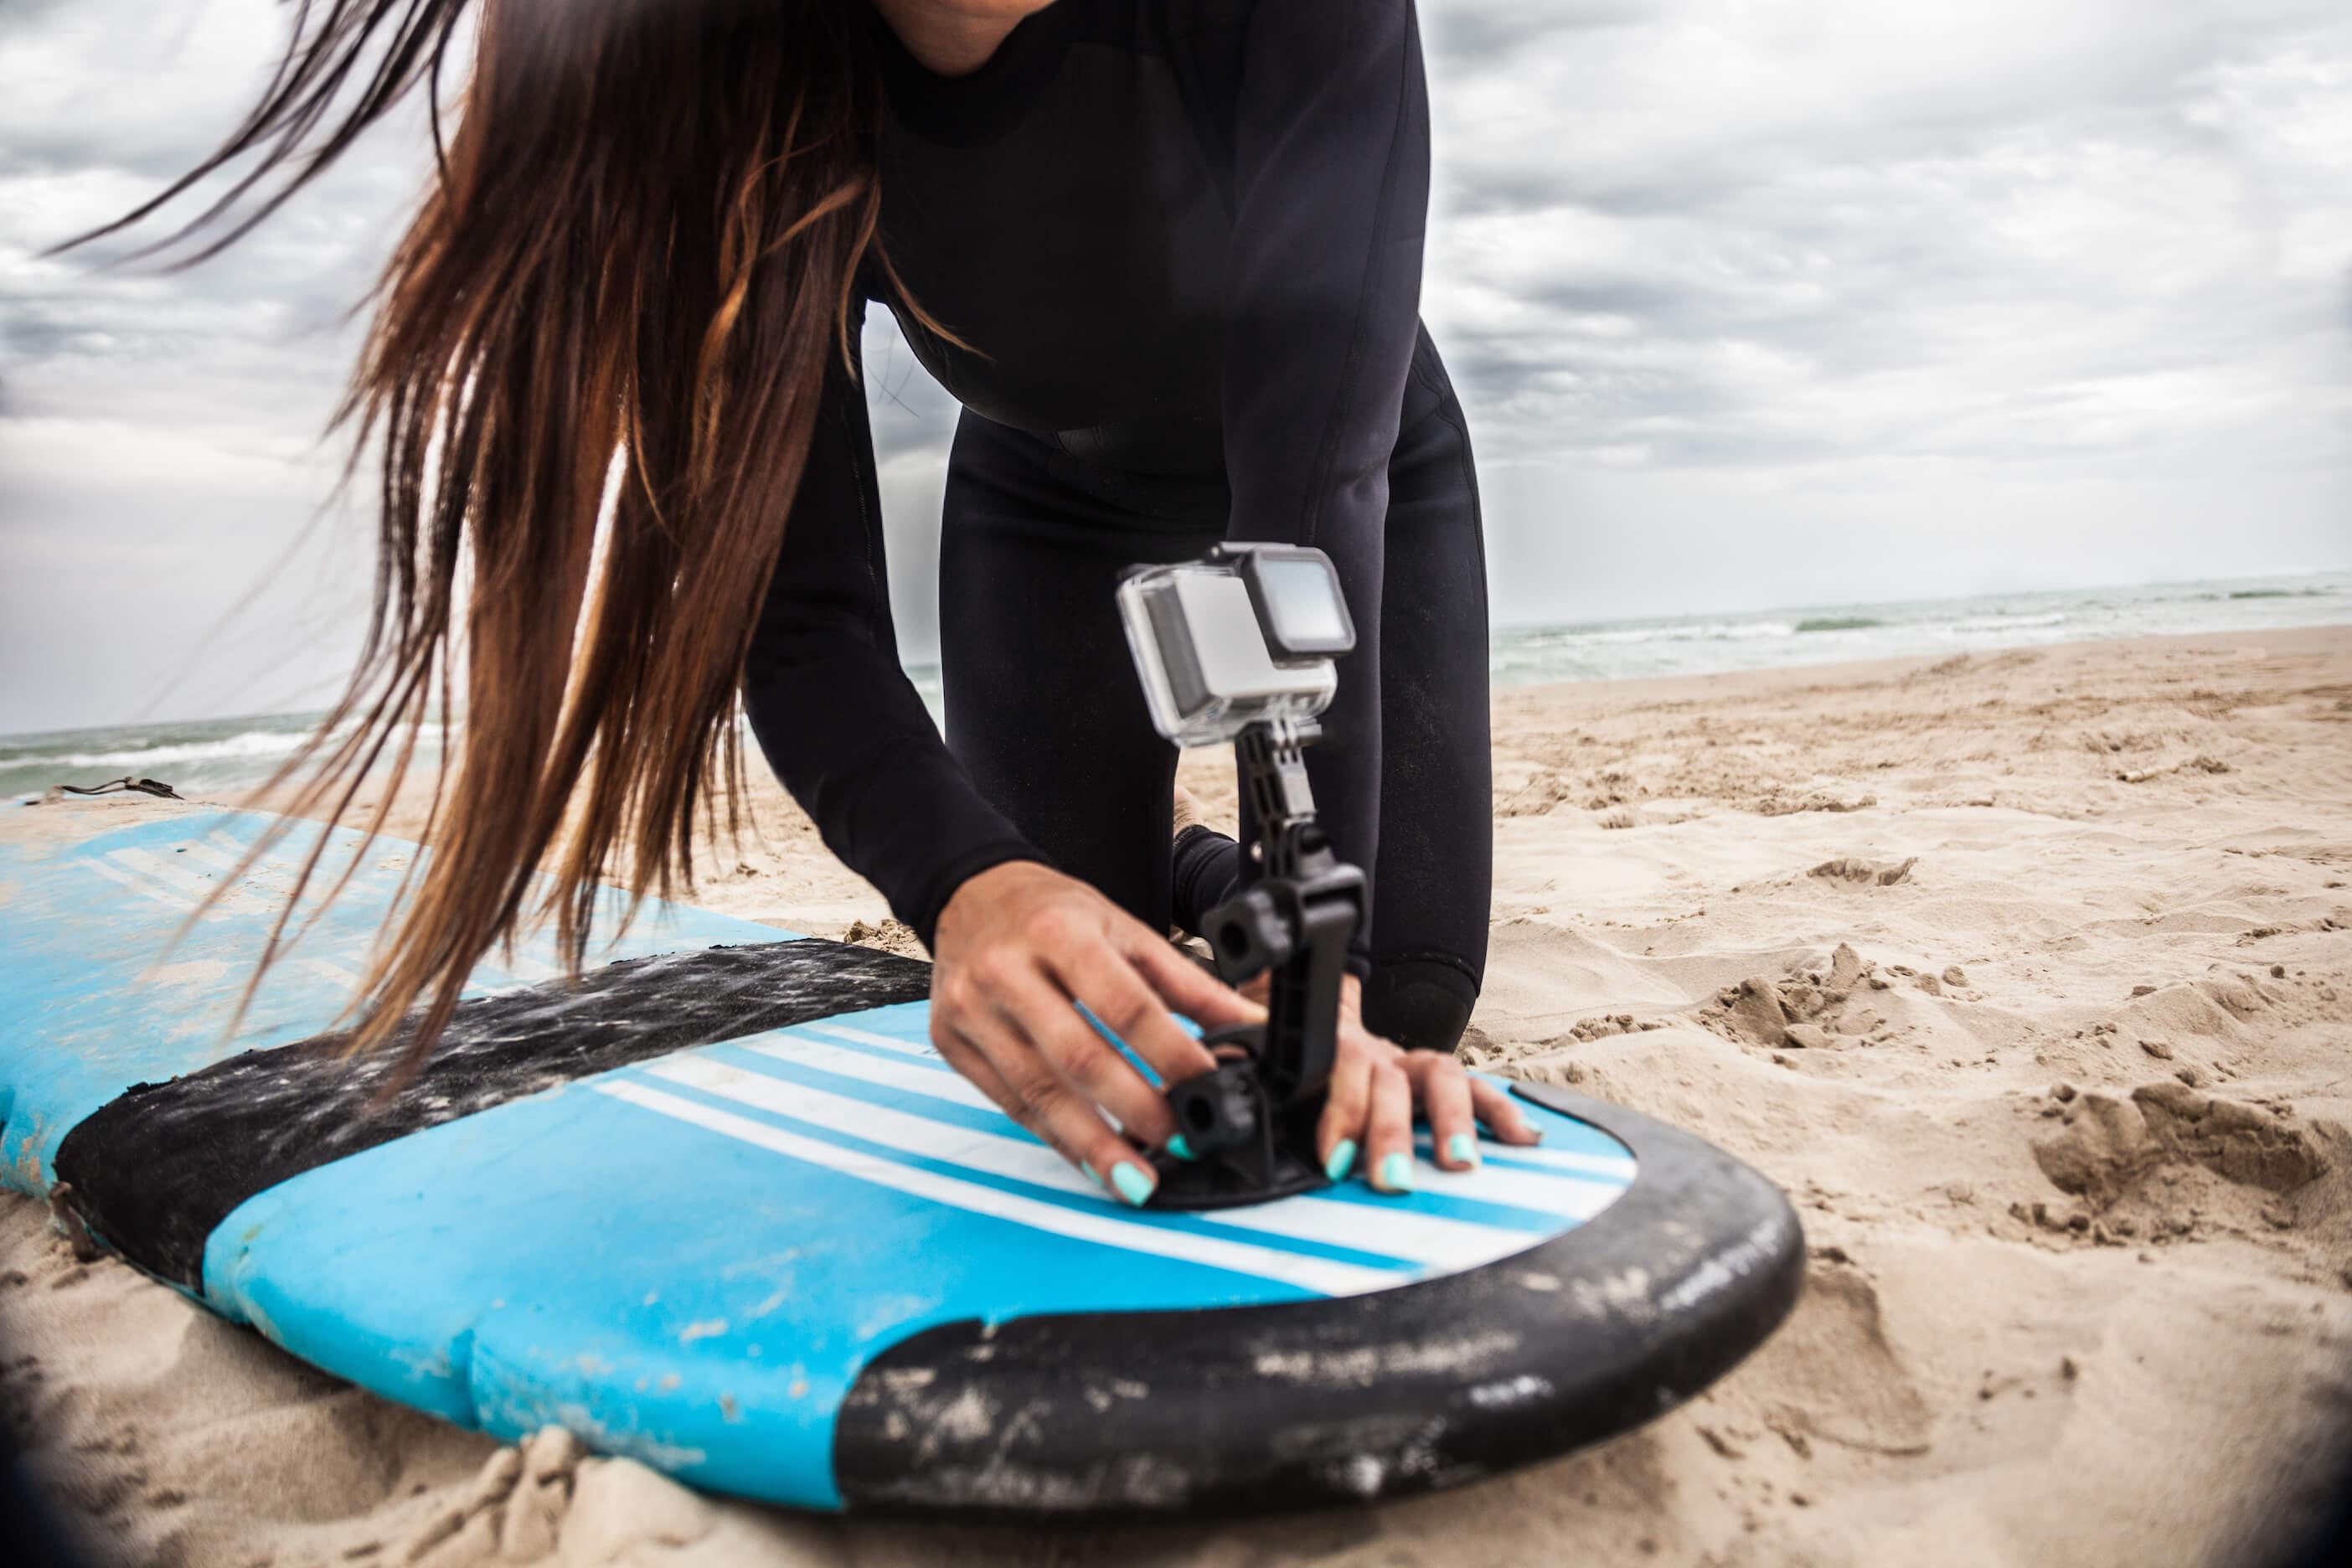 go_pro_surfboard